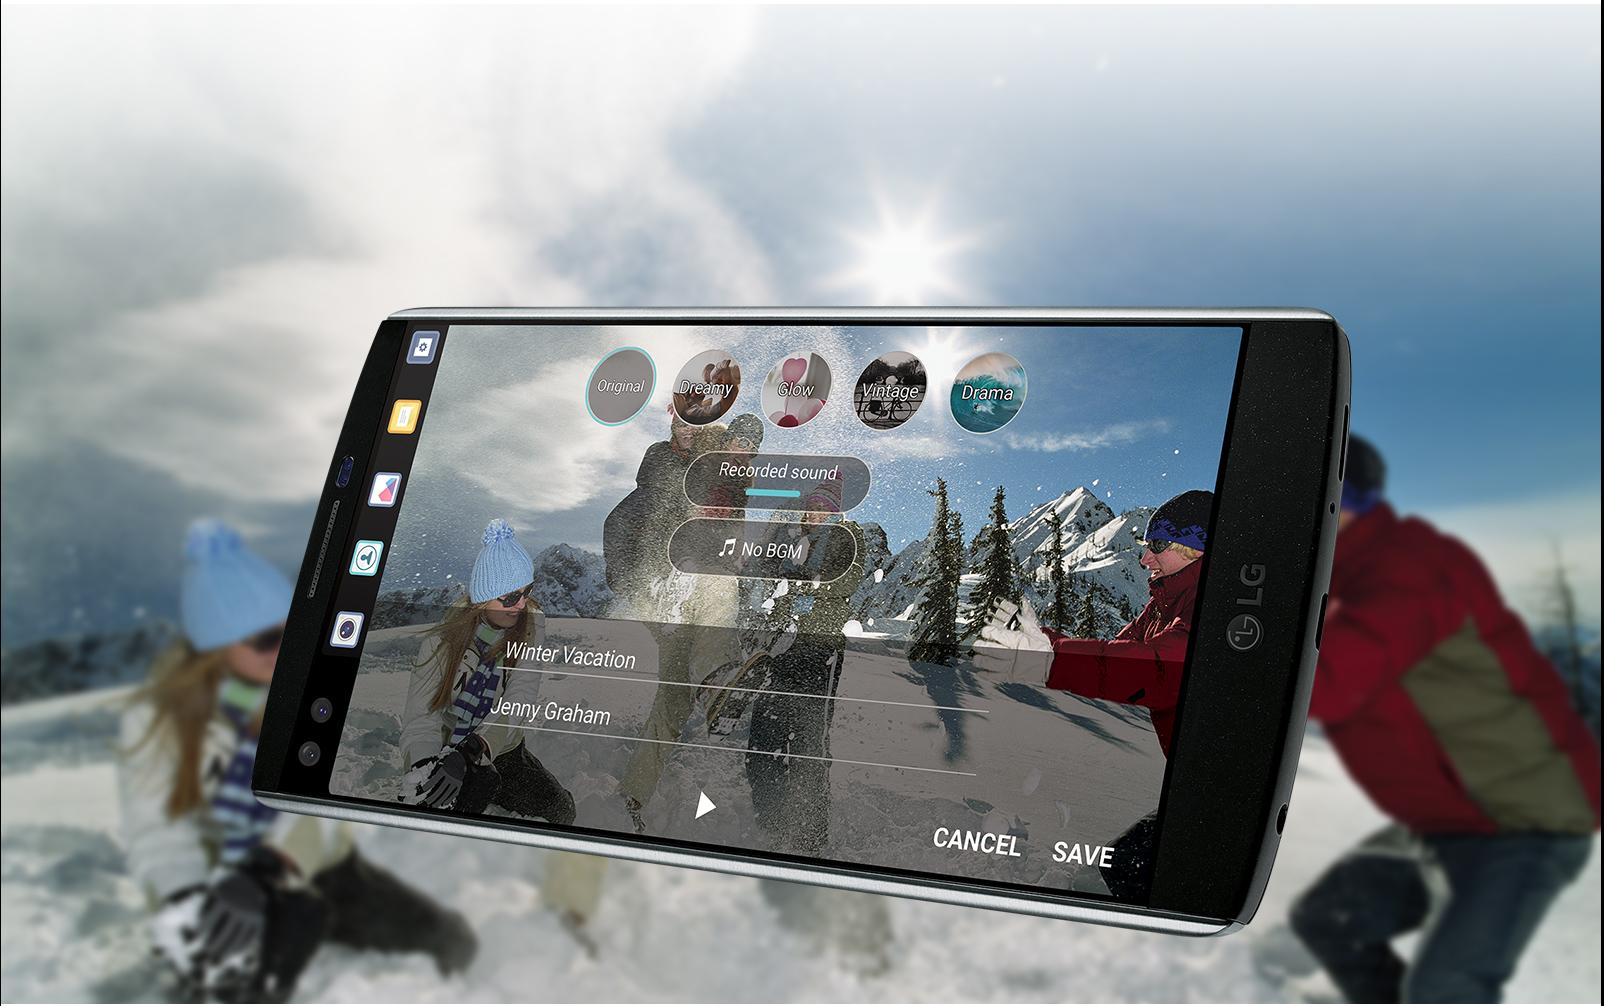 LG V10 H900 64GB AT&T Unlocked 4G LTE Hexa-Core Android Phone w/ 16MP  Camera - Black